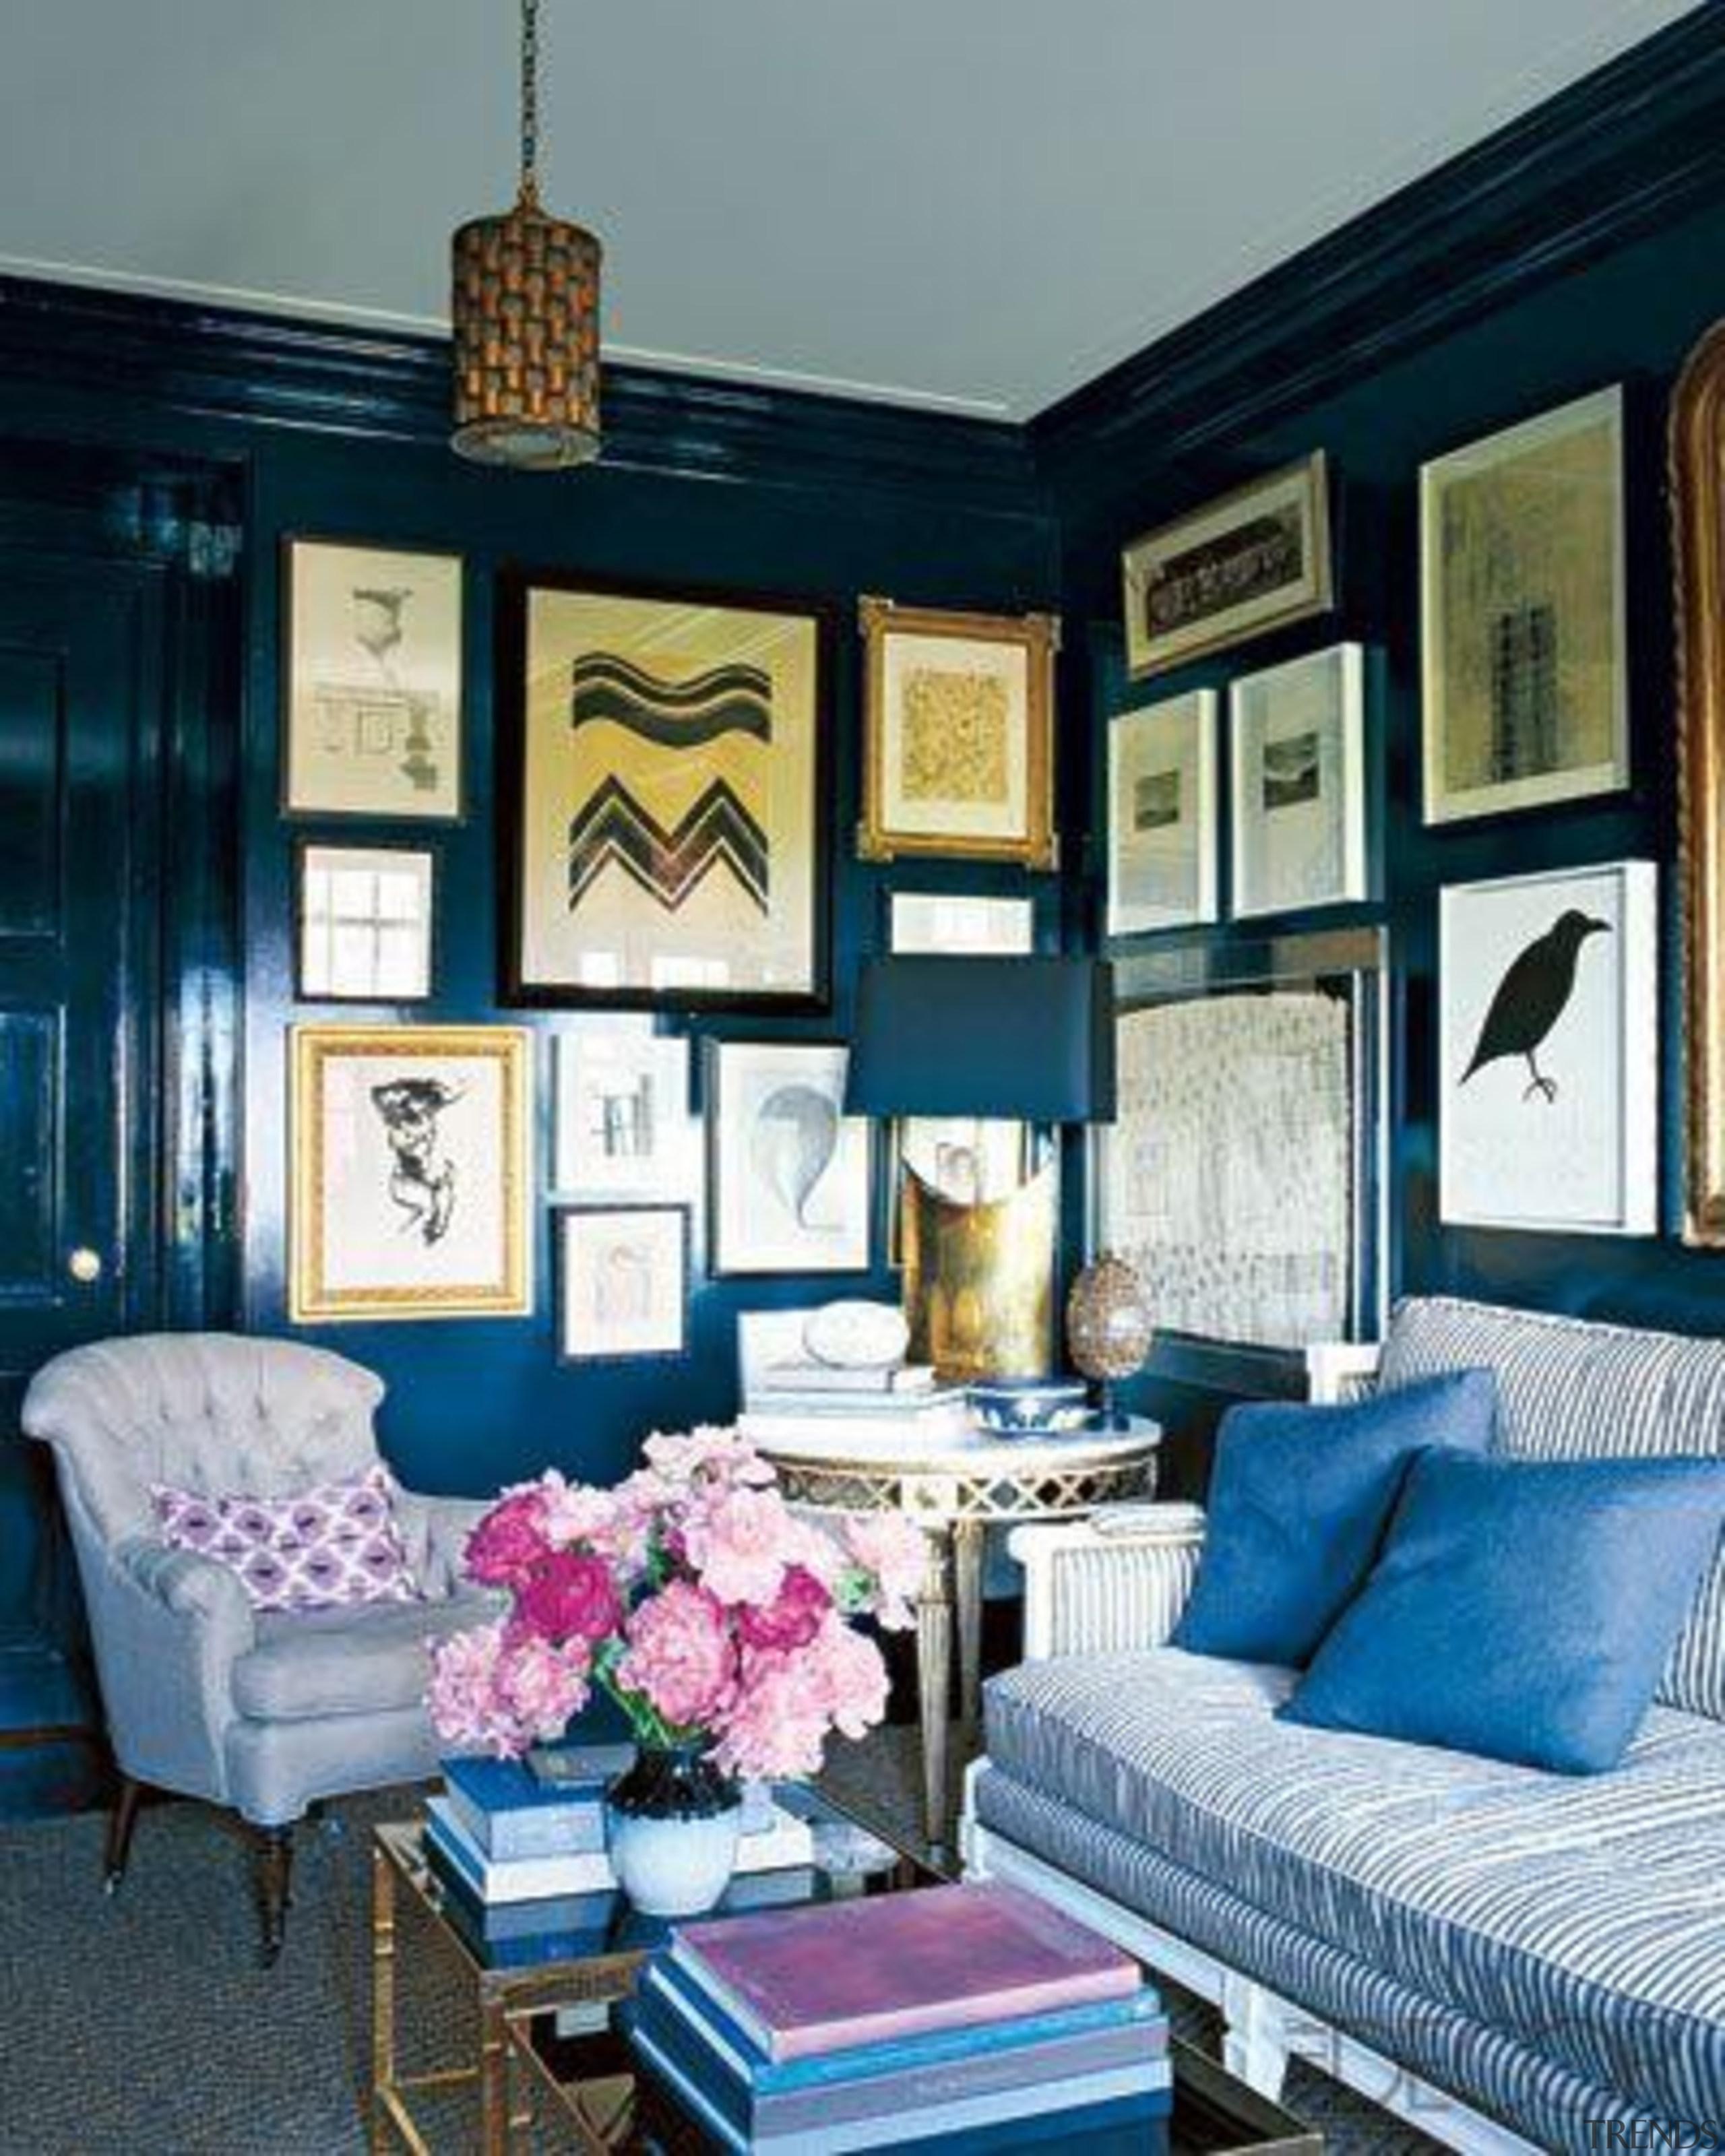 cerulean elledecorcom.jpg - cerulean_elledecorcom.jpg - blue   furniture blue, furniture, home, interior design, living room, room, wall, window